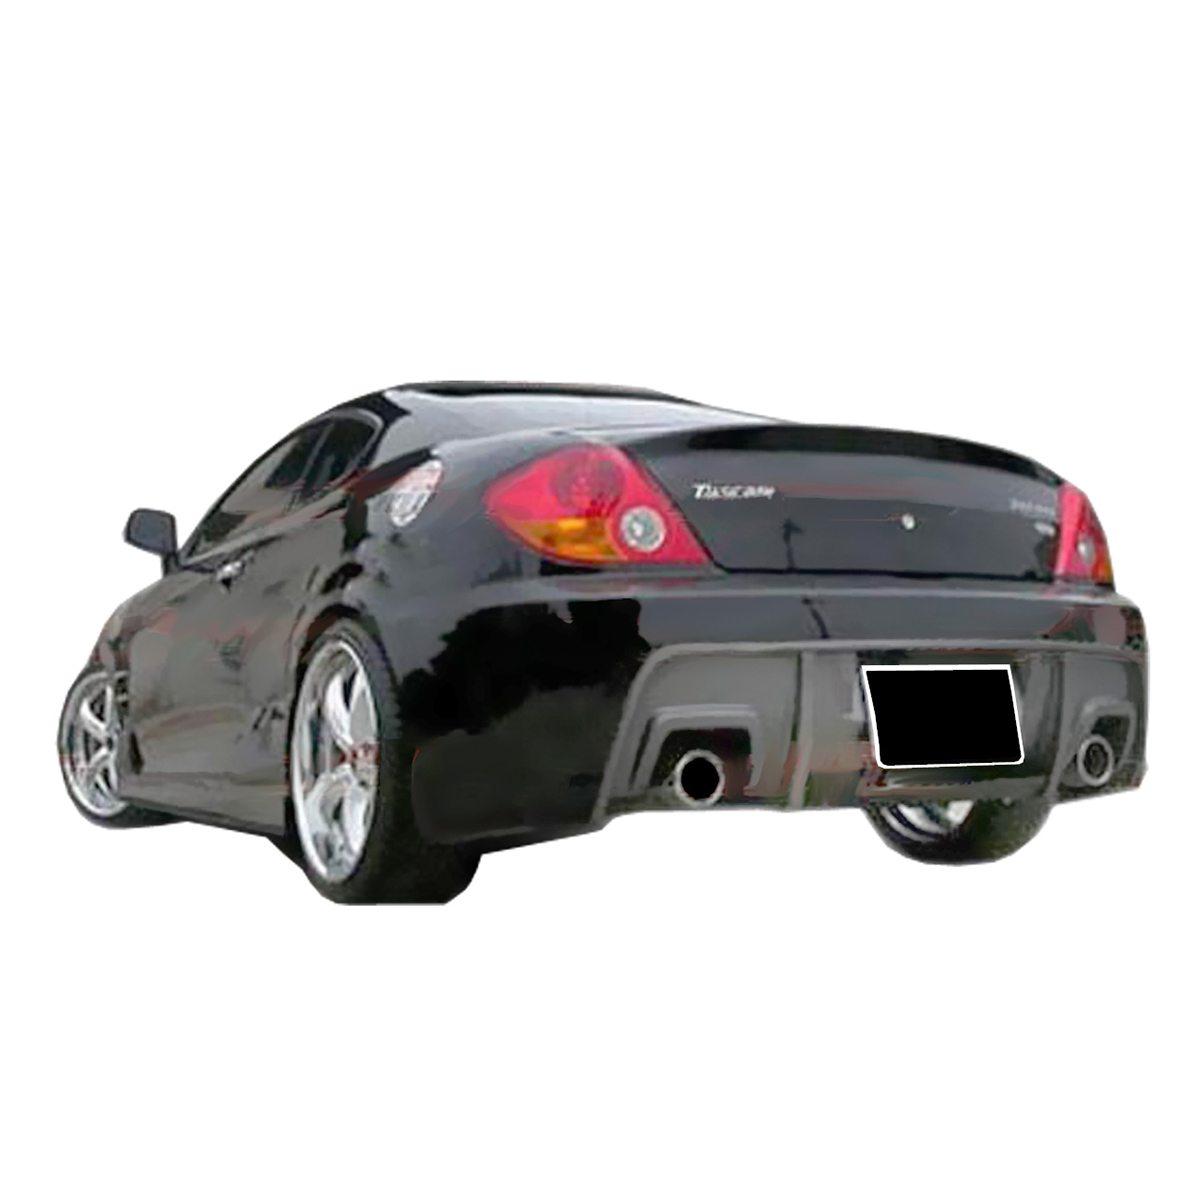 Hyundai-2003-Coupe-Tras-PCM019